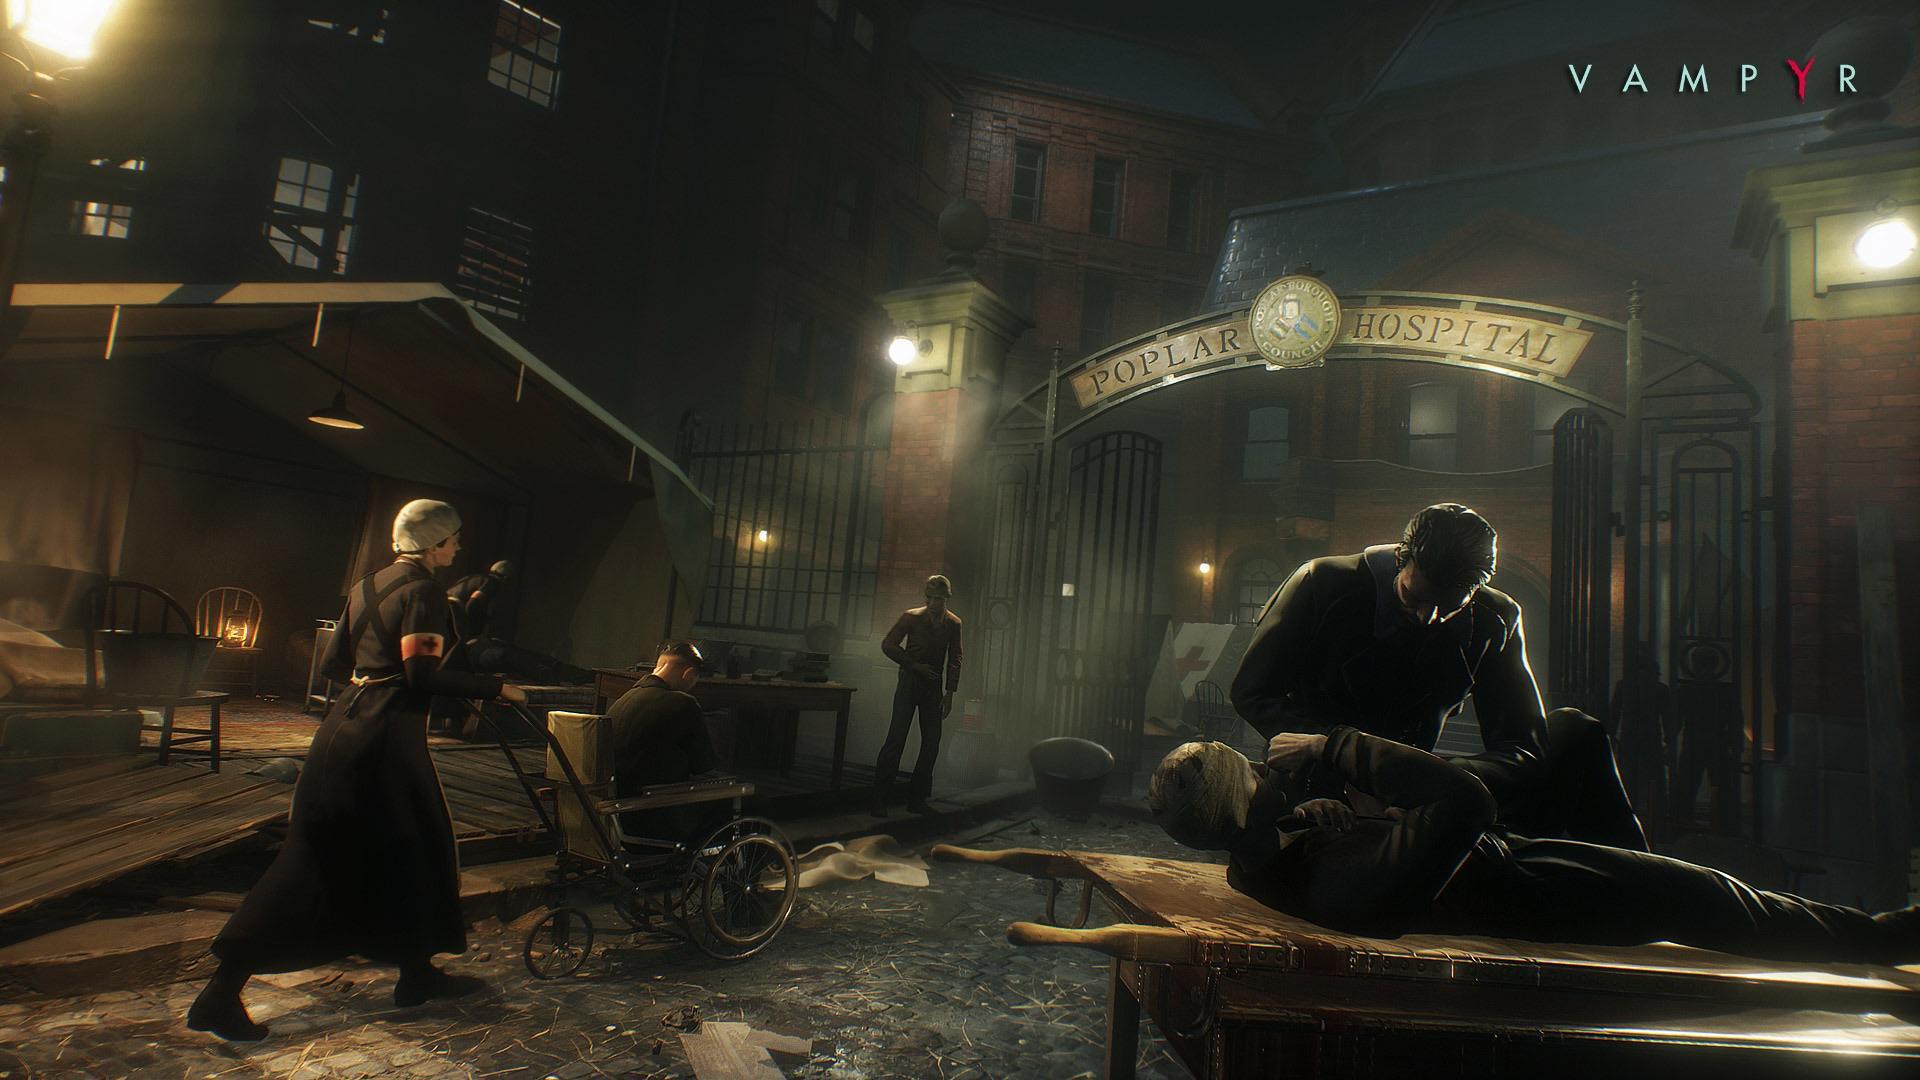 Vampyr PS4 Screenshot 04